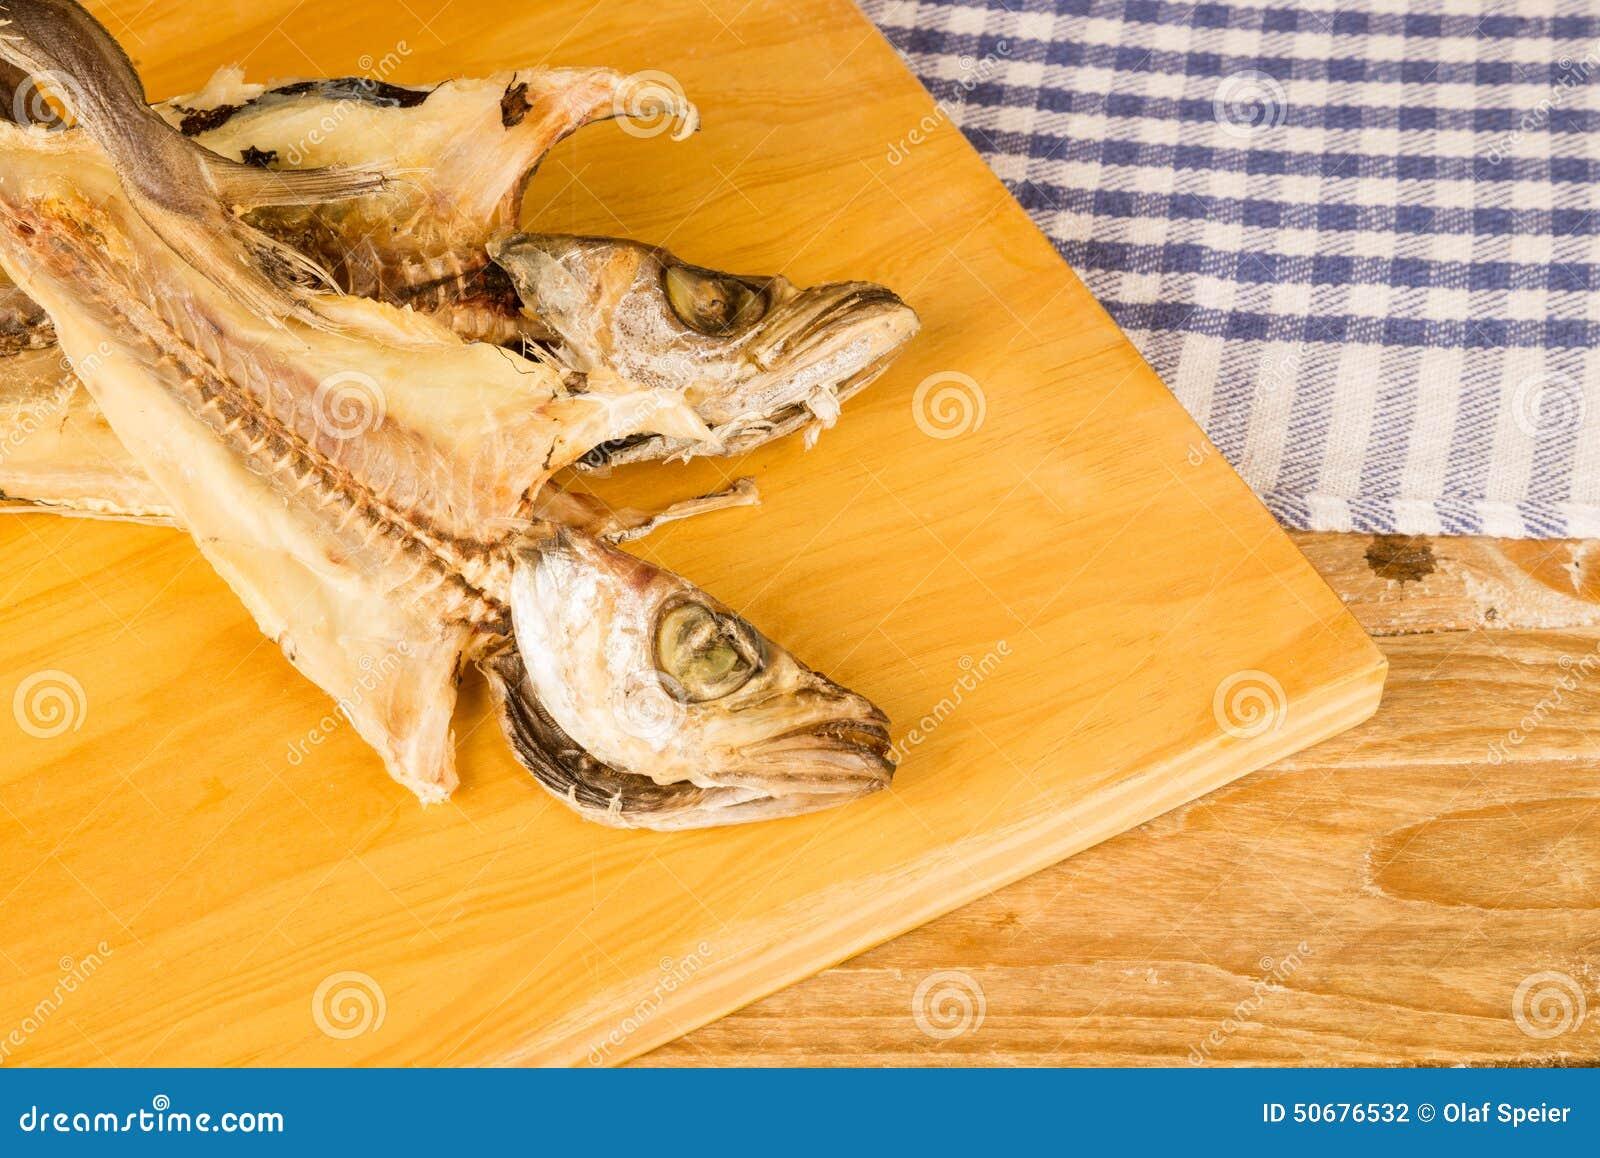 Download 干白垩粉 库存照片. 图片 包括有 干燥, 成份, 准备, 食物, 烘干, 保留, 治疗, 烹调, 白垩粉 - 50676532